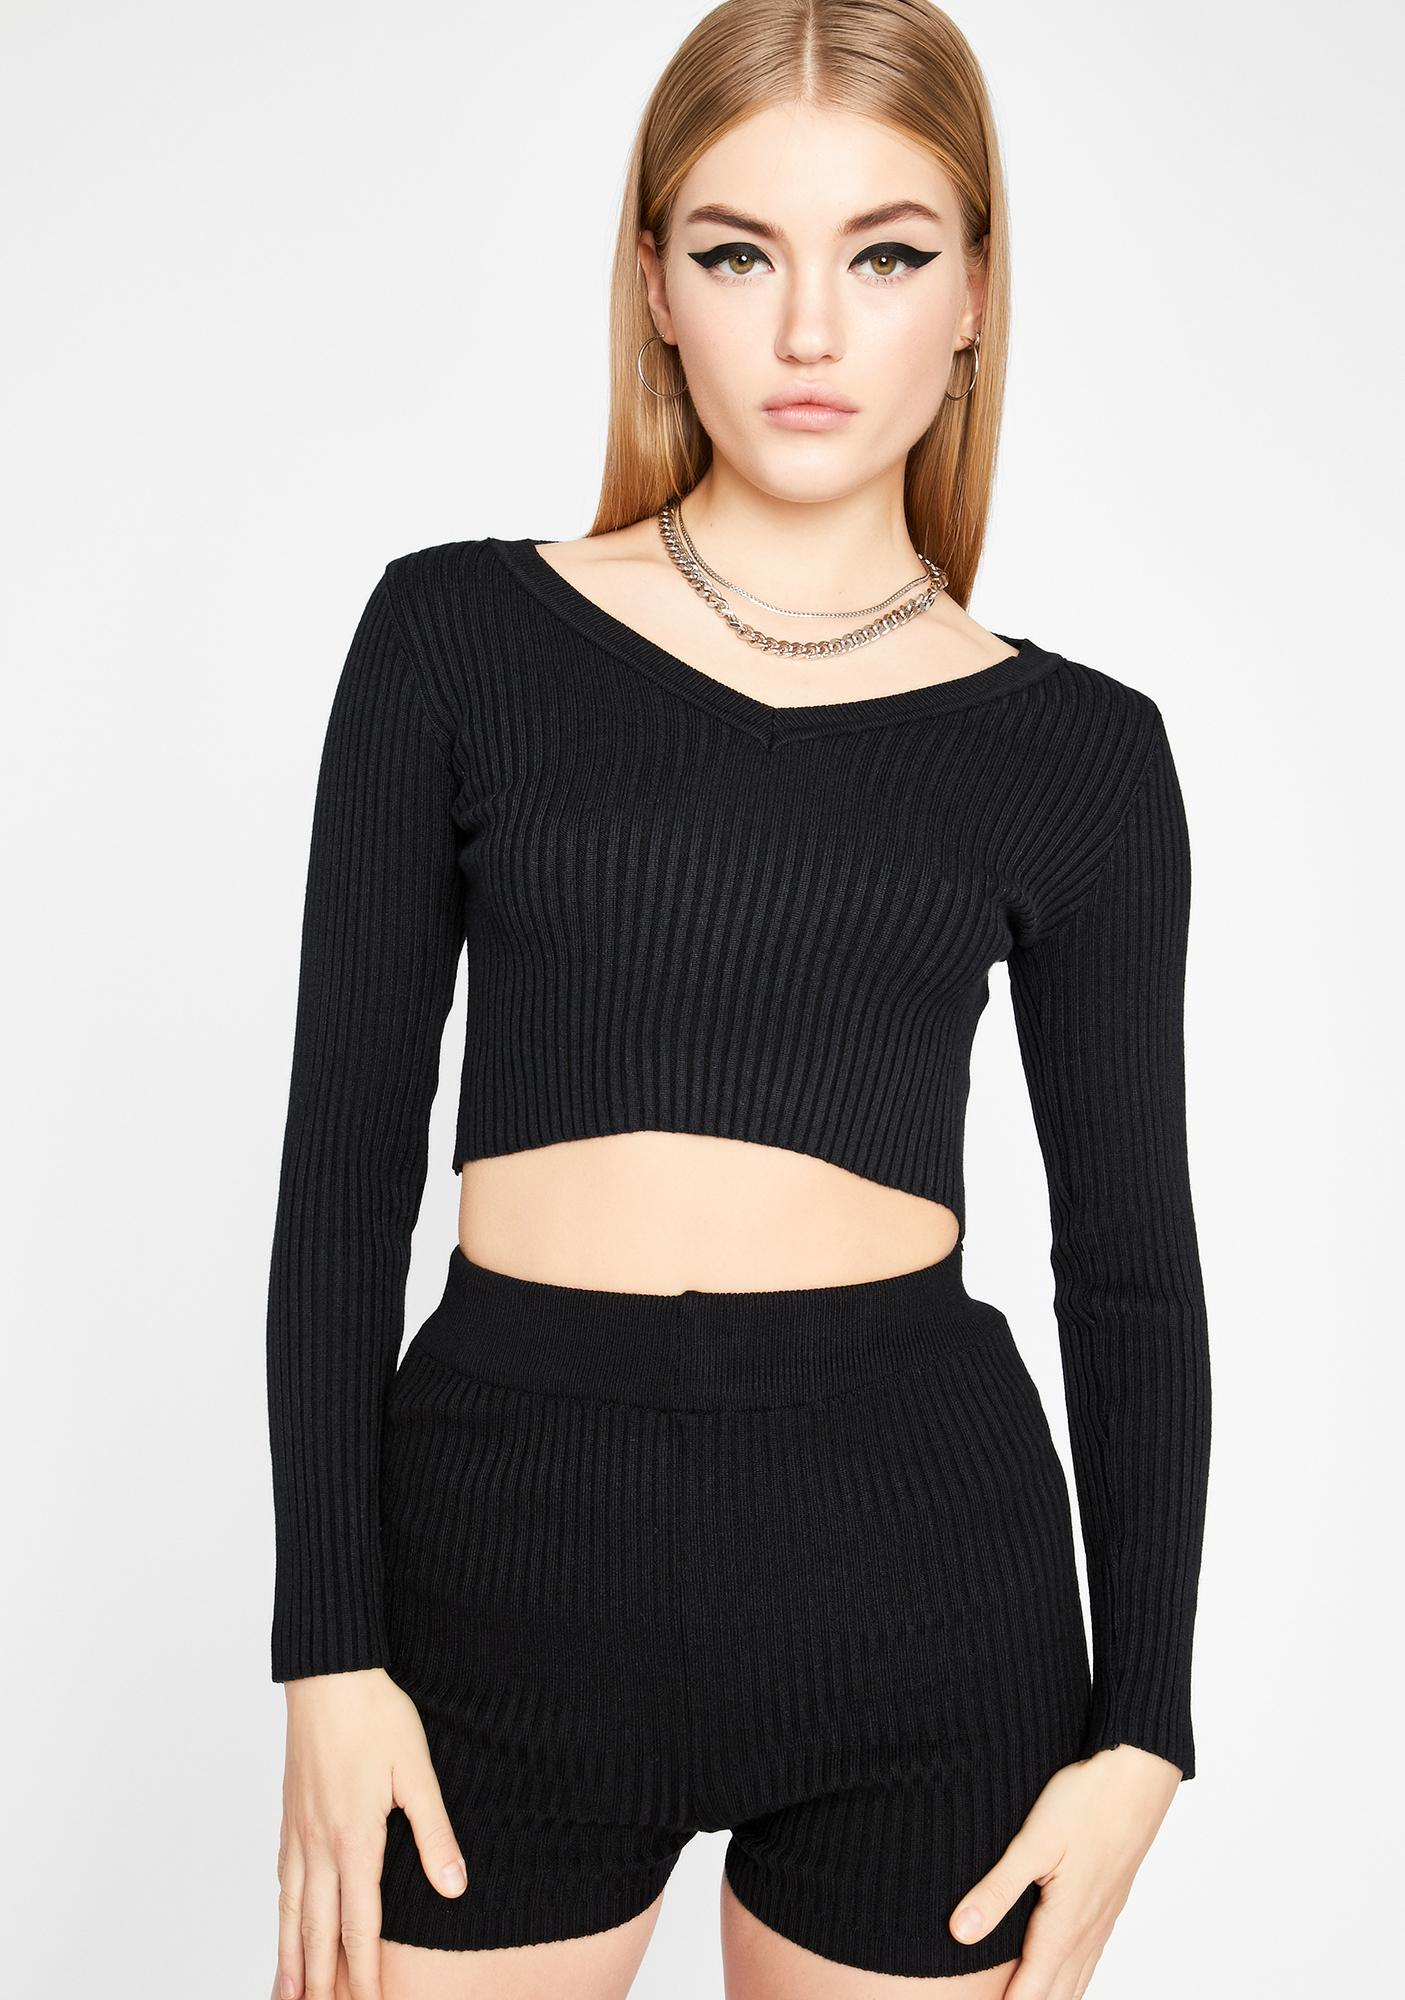 Midnight Melrose Avenue Sweater Set